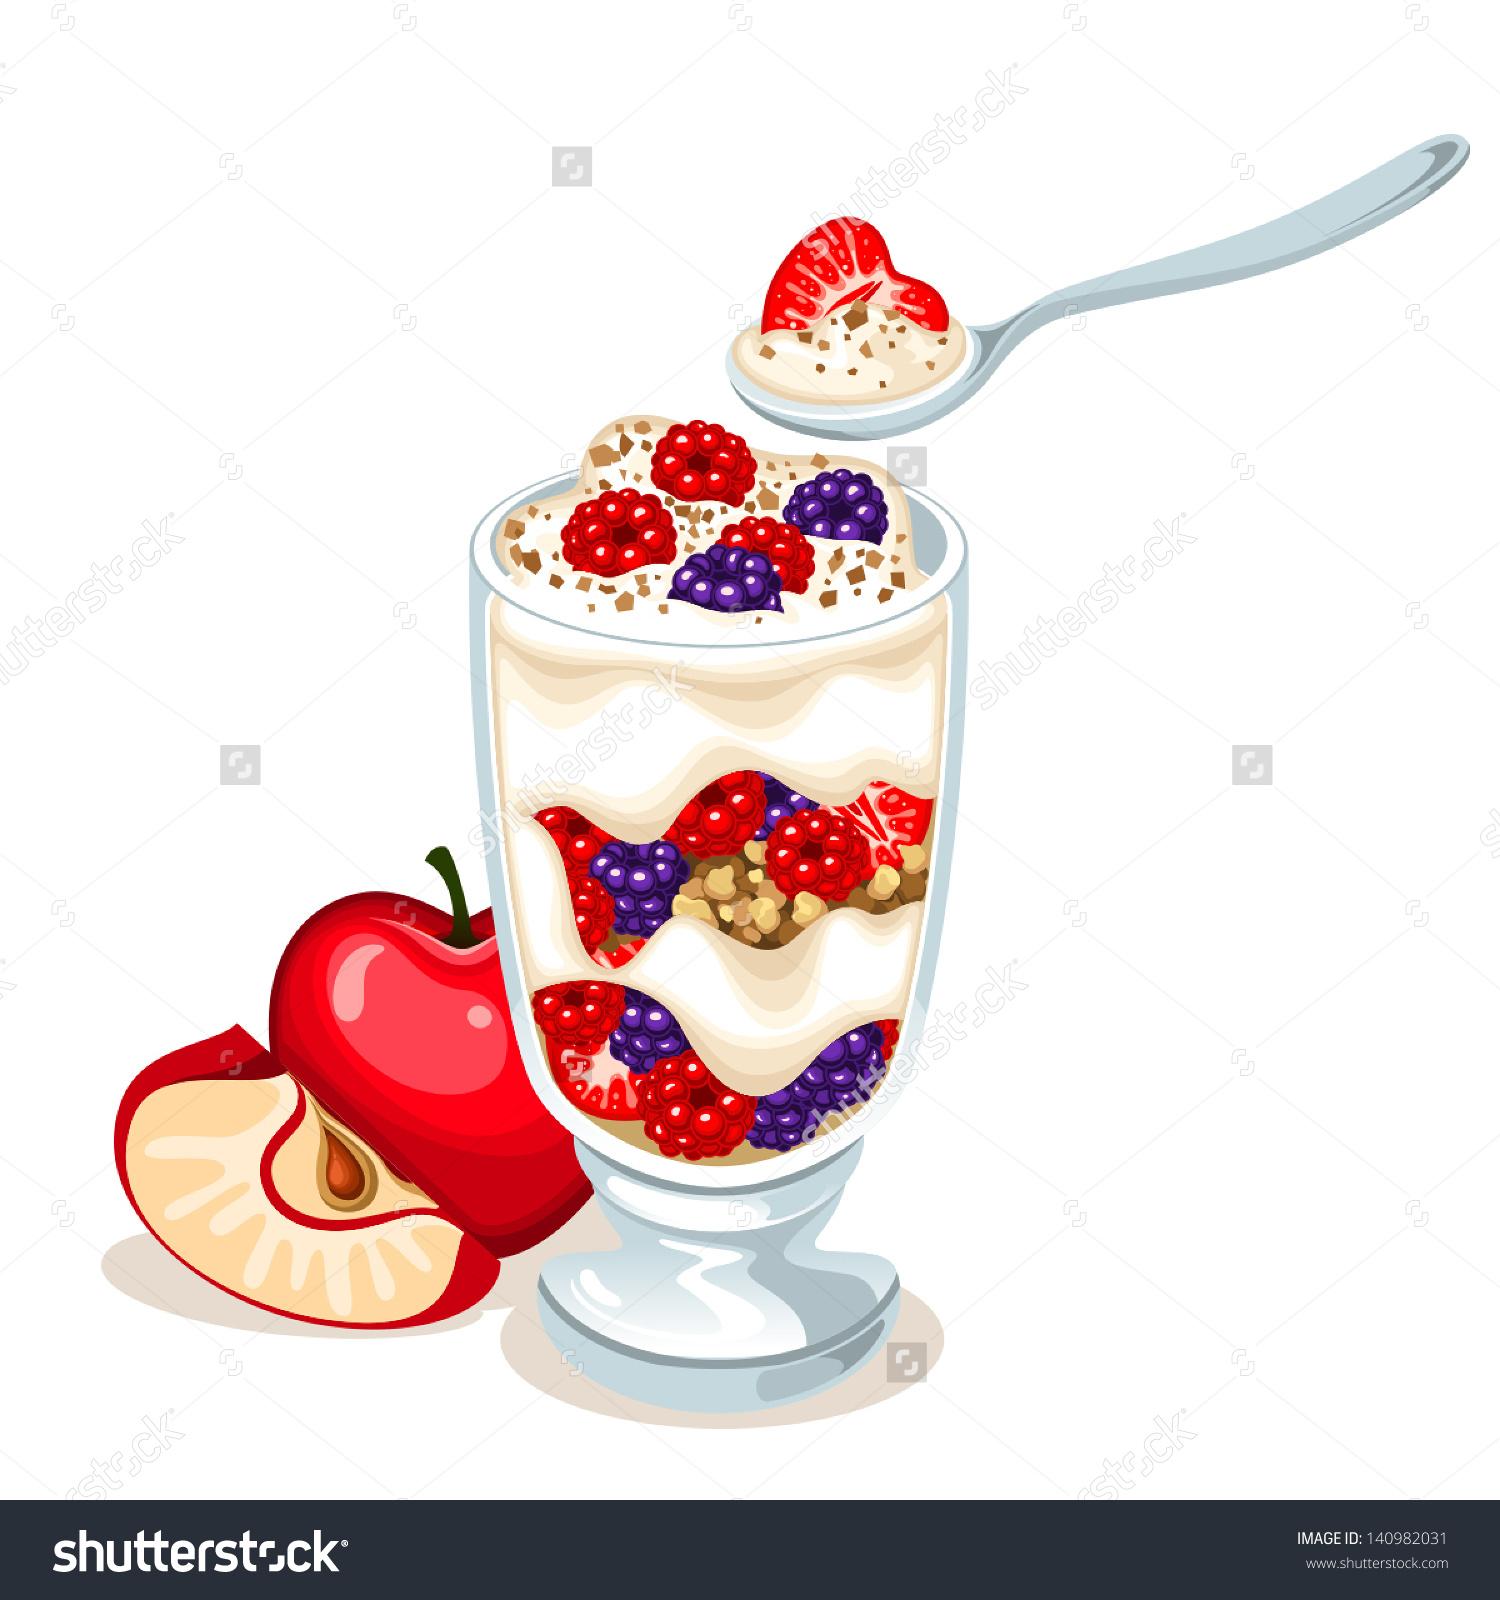 890 Yogurt free clipart.